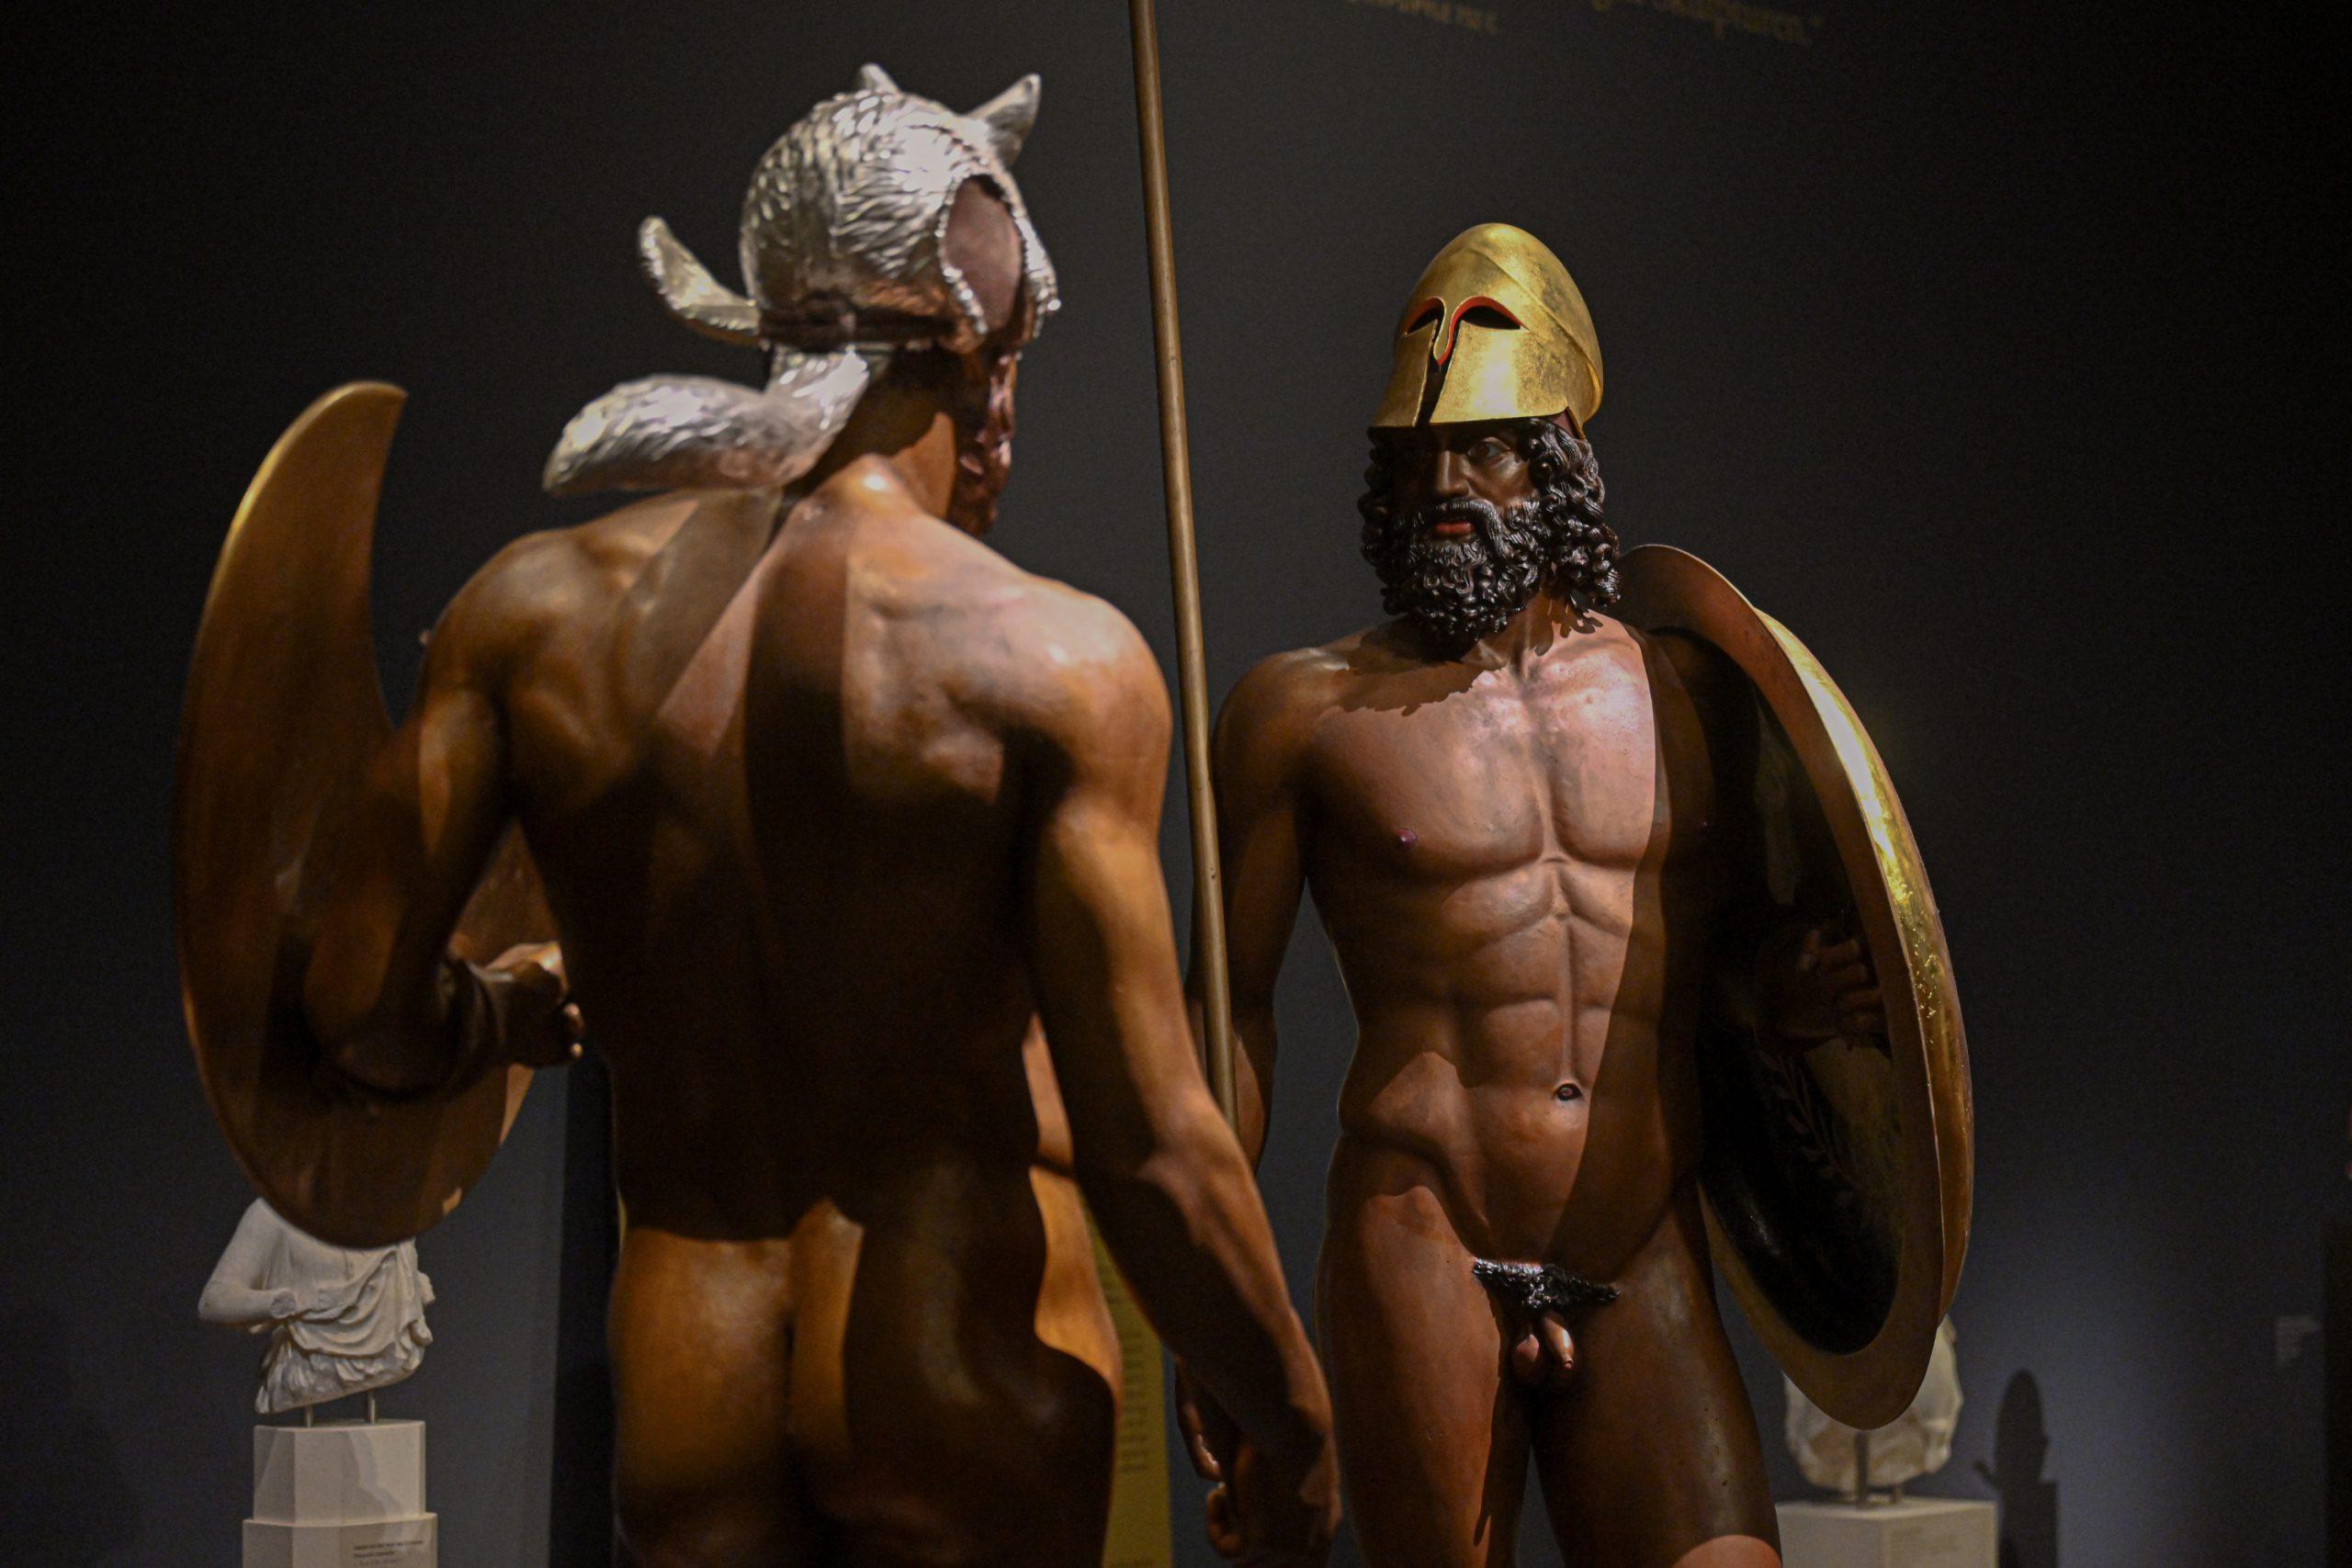 Bronzegruppe aus Riace (mit Goldhelm: Krieger A, Erechtheus, Sohn der Göttin Athena; mit Fuchsfellkapp: Krieger B, Eumolpos, Sohn des Meeresgottes Poseidon).